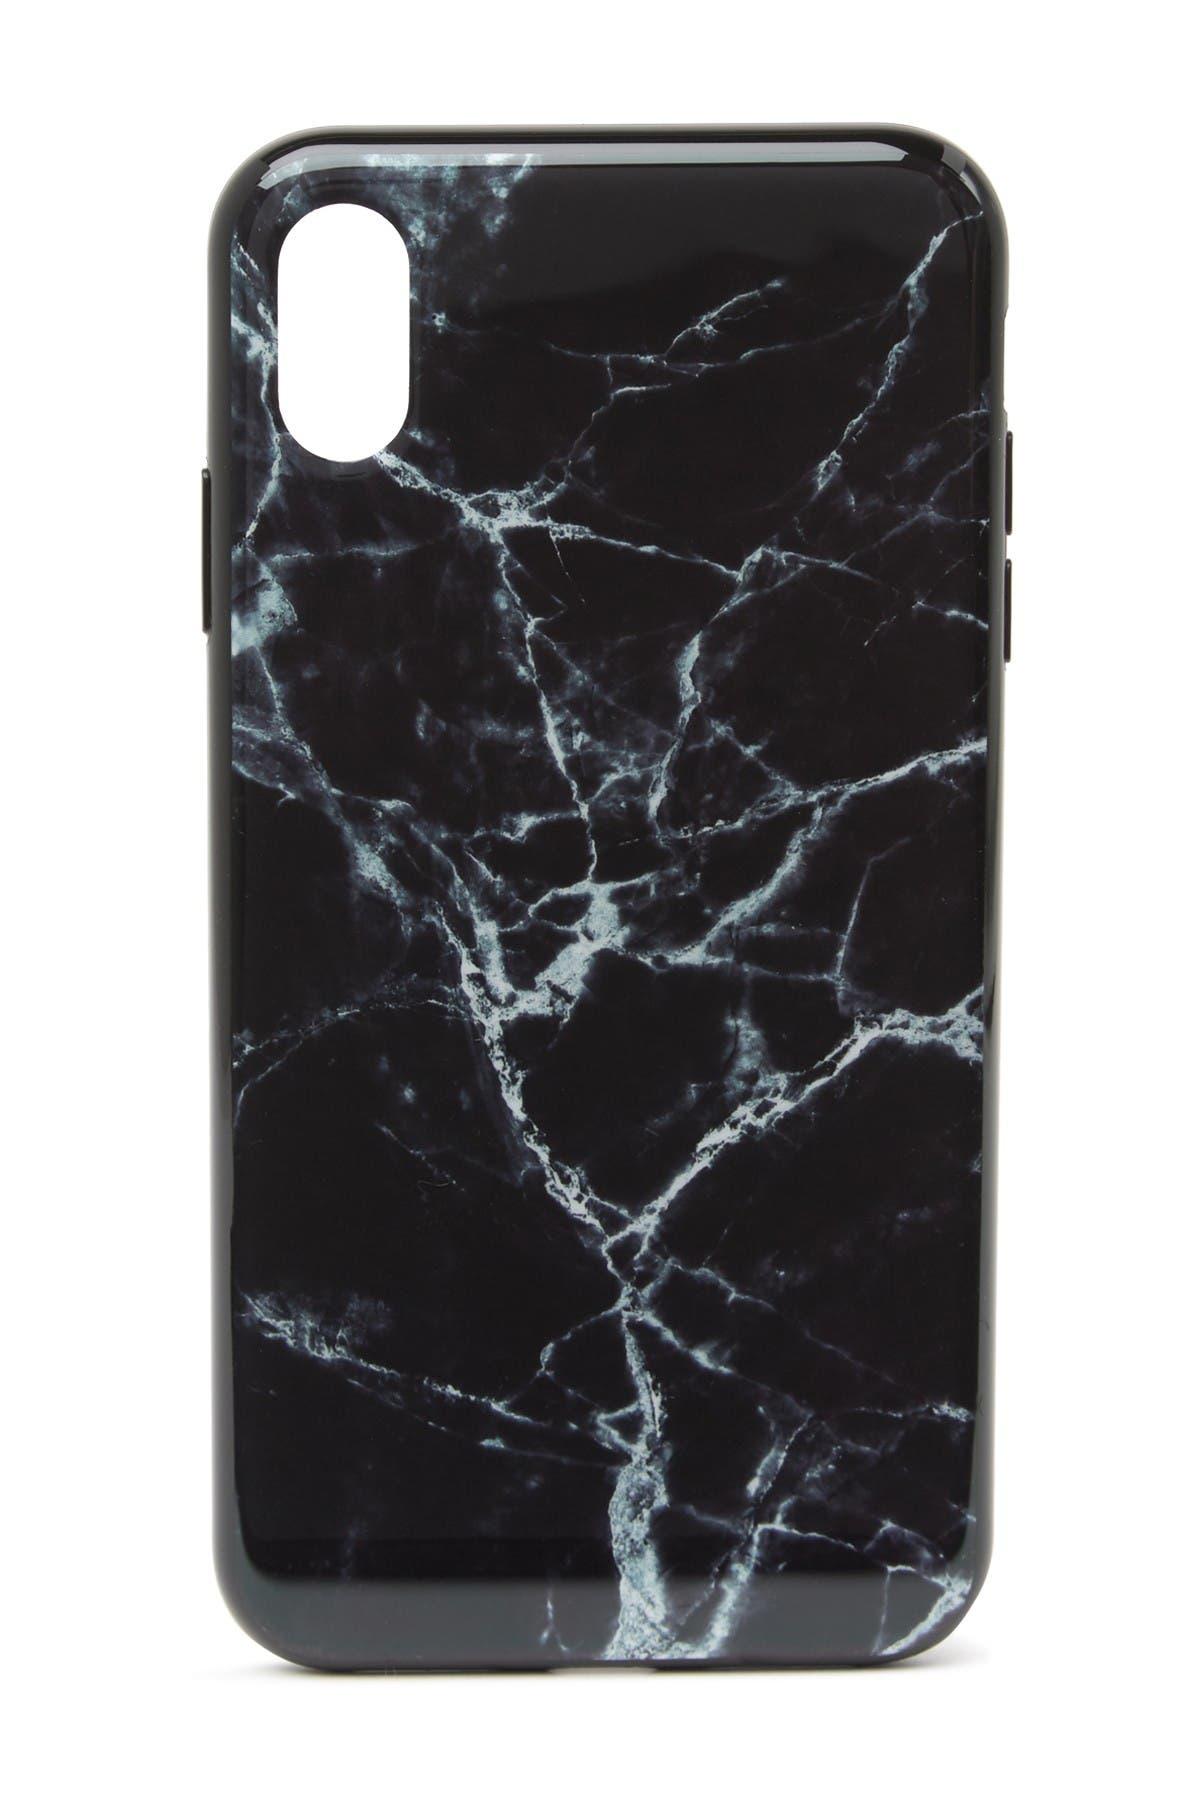 FELONY CASE Black Polished Marble iPhone 11 Max Case